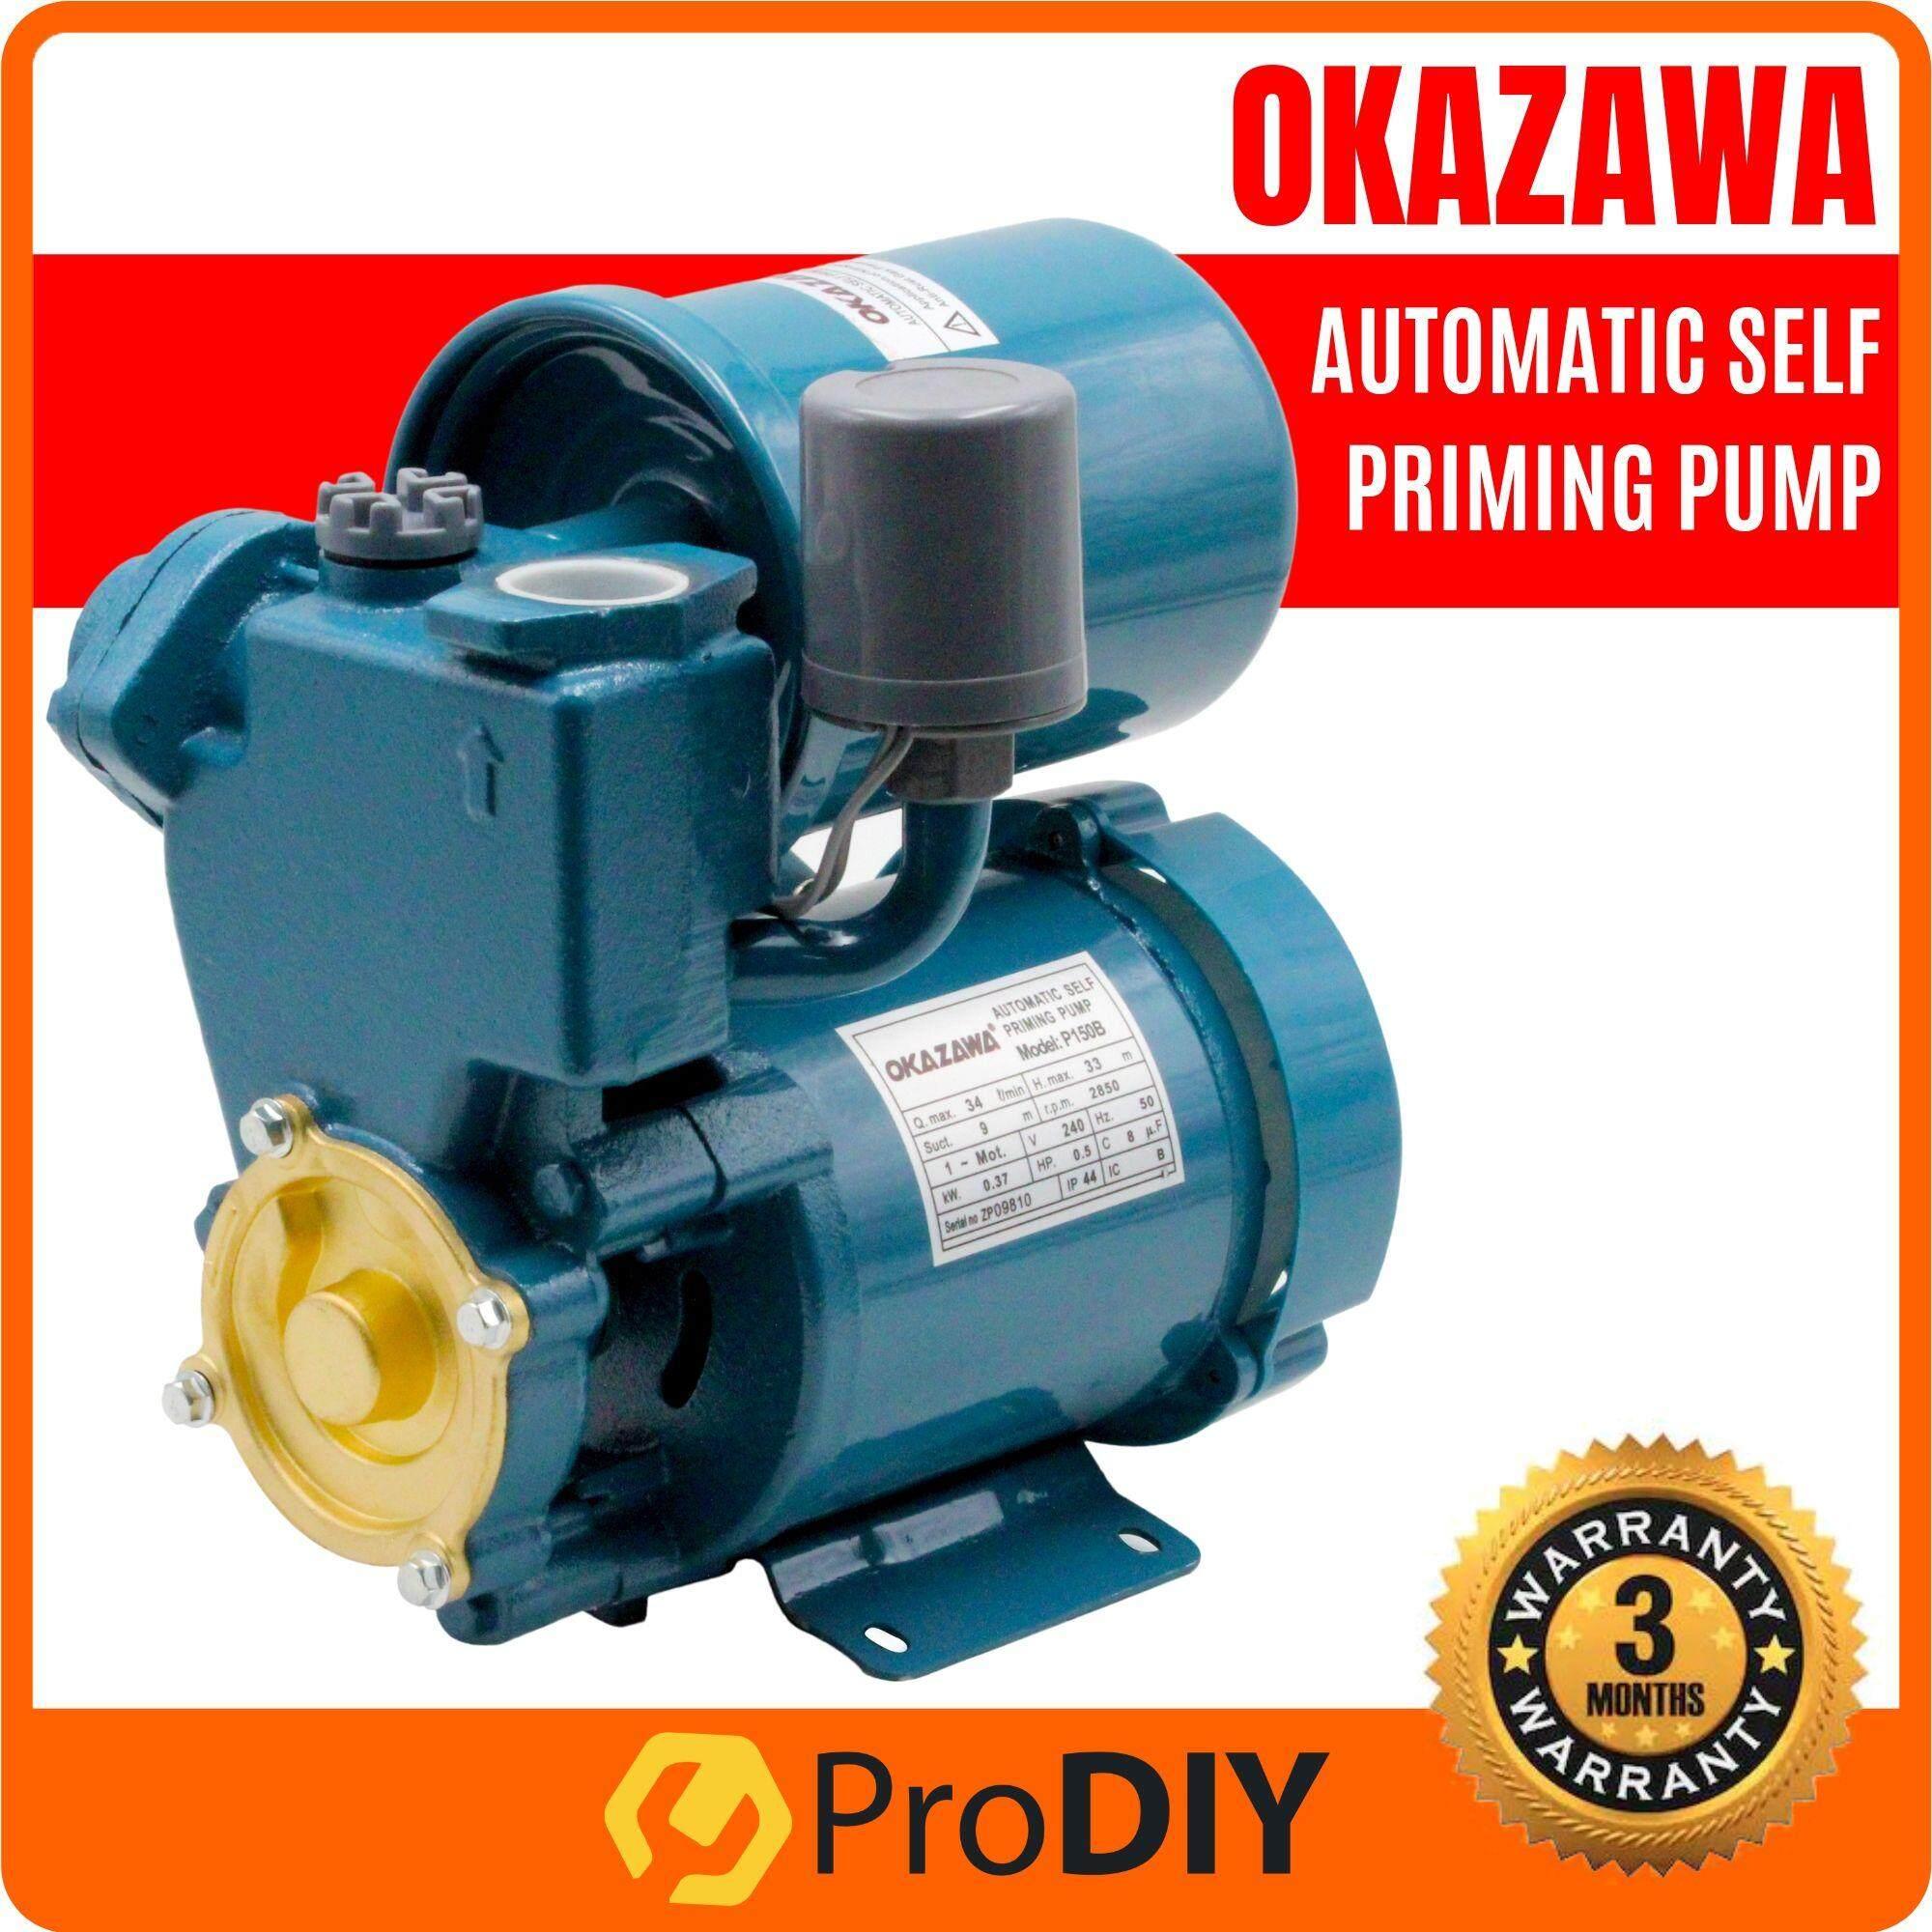 OKAZAWA Self Priming Automatic Water Pump 0.5HP ( P150B )